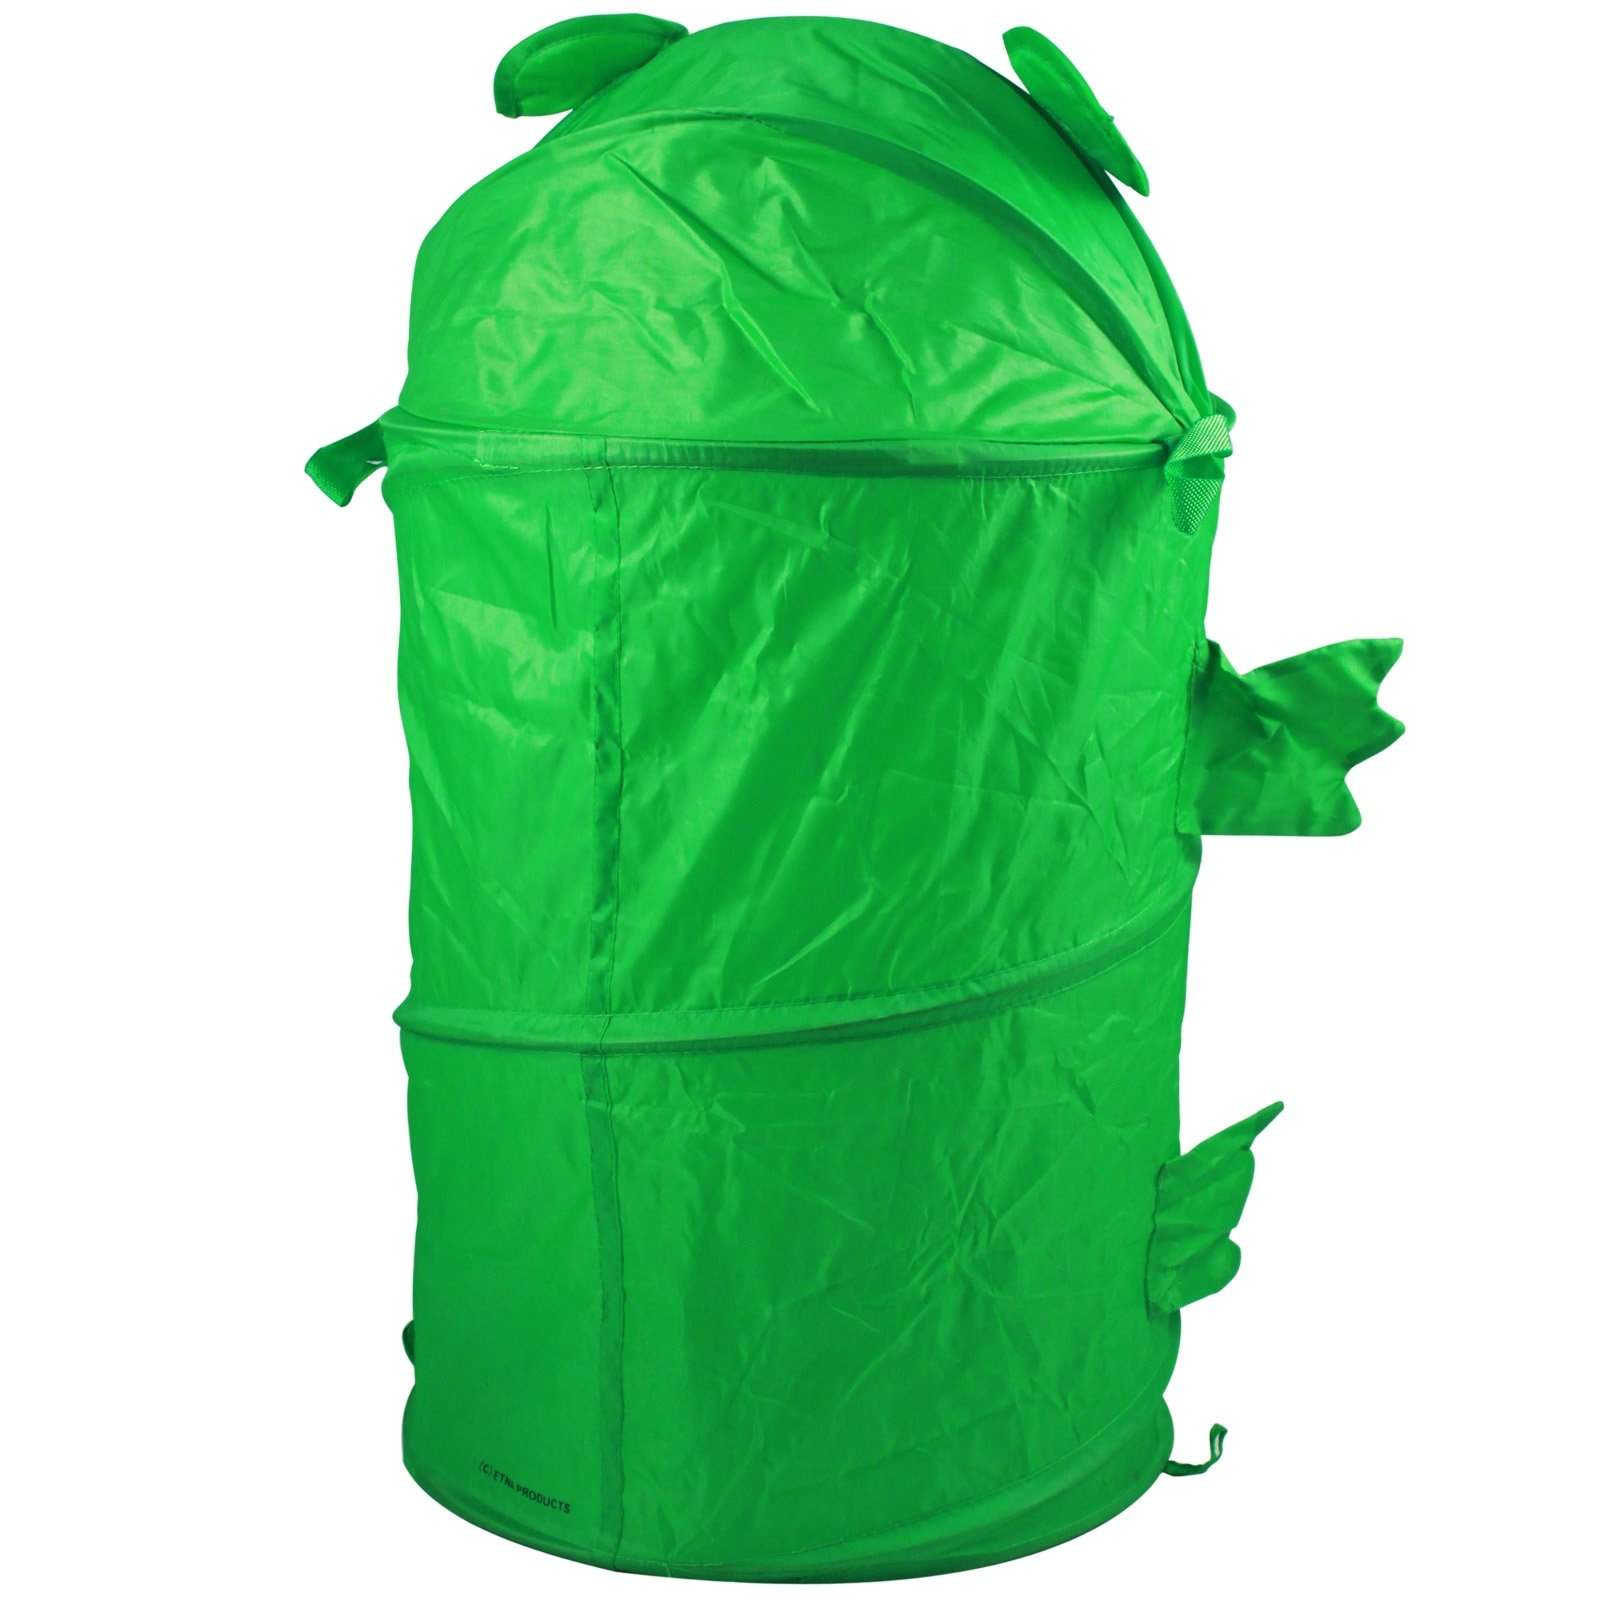 KidPlay Pop Up Green Frog Hamper Kids Laundry Basket Collapsible Nylon Bin